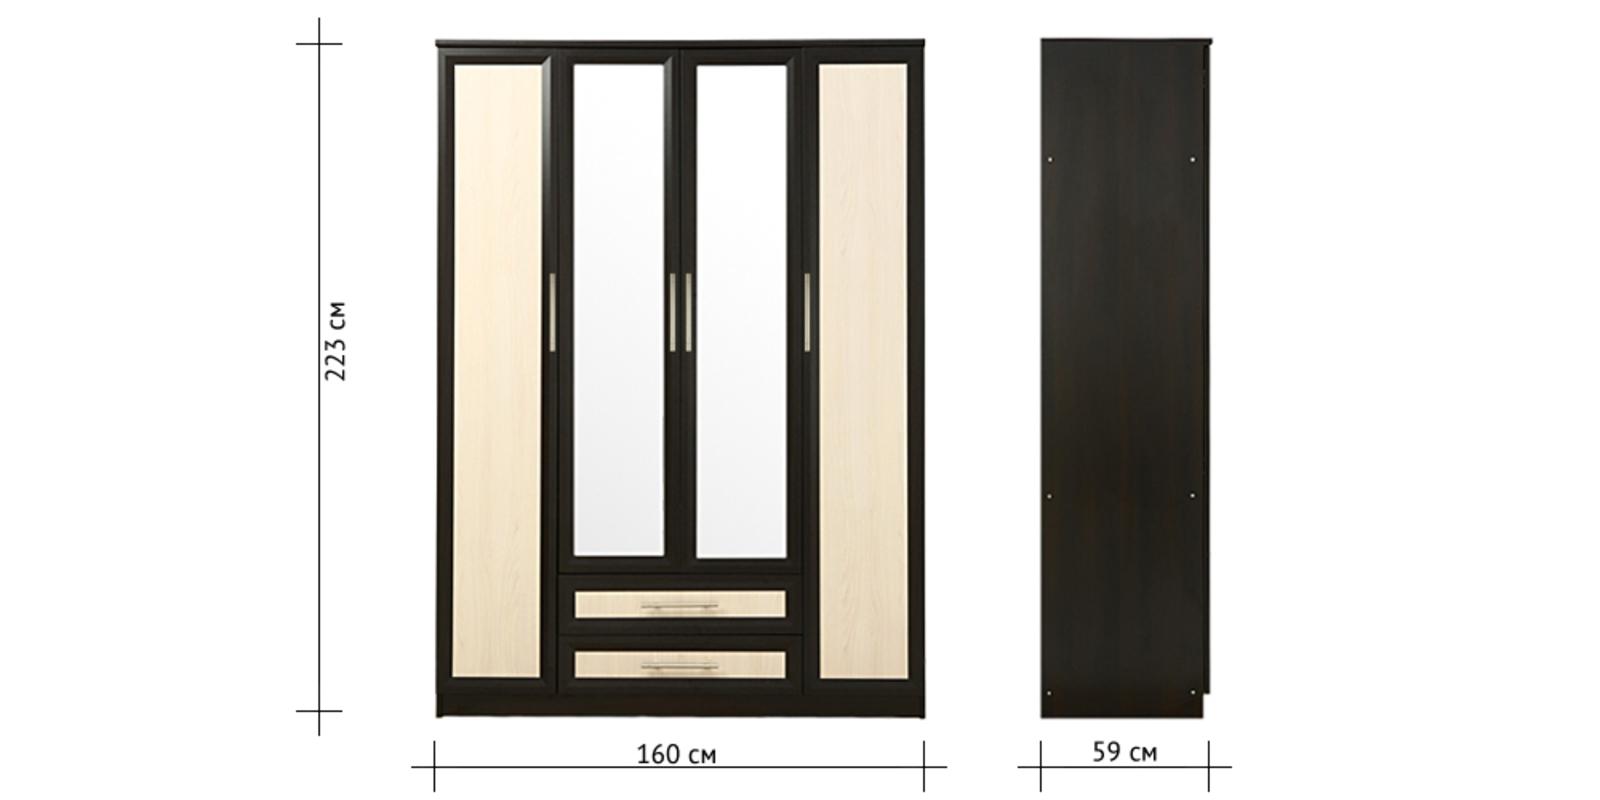 Шкаф распашной 4-х дверный Индиана (дуб феррара/дуб сонома+зеркало)